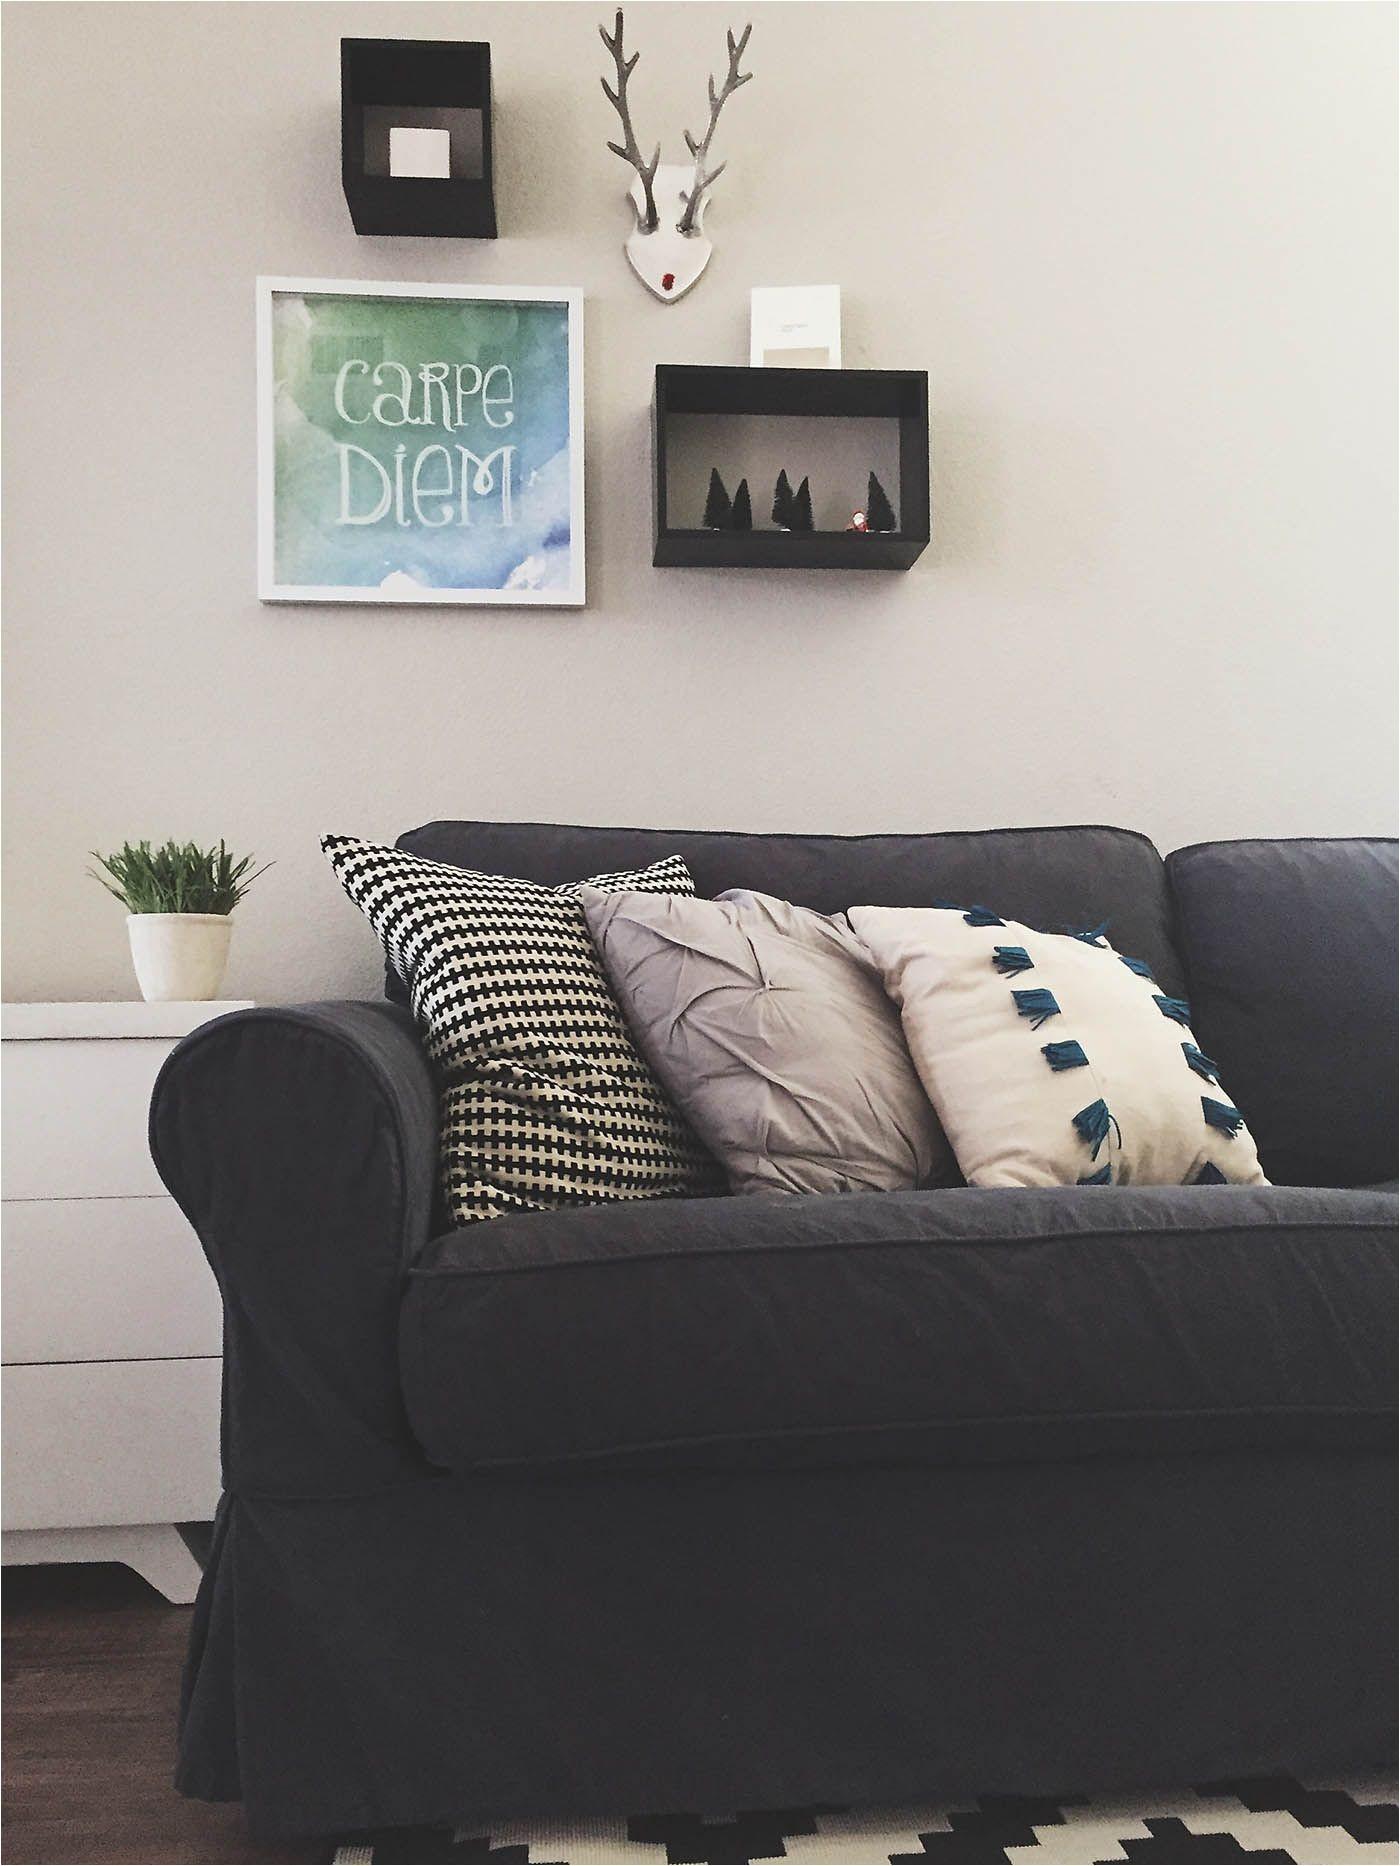 Ll Bean sofa Slipcover How to Dye A sofa Slipcover Diy Pinterest sofa Slipcovers